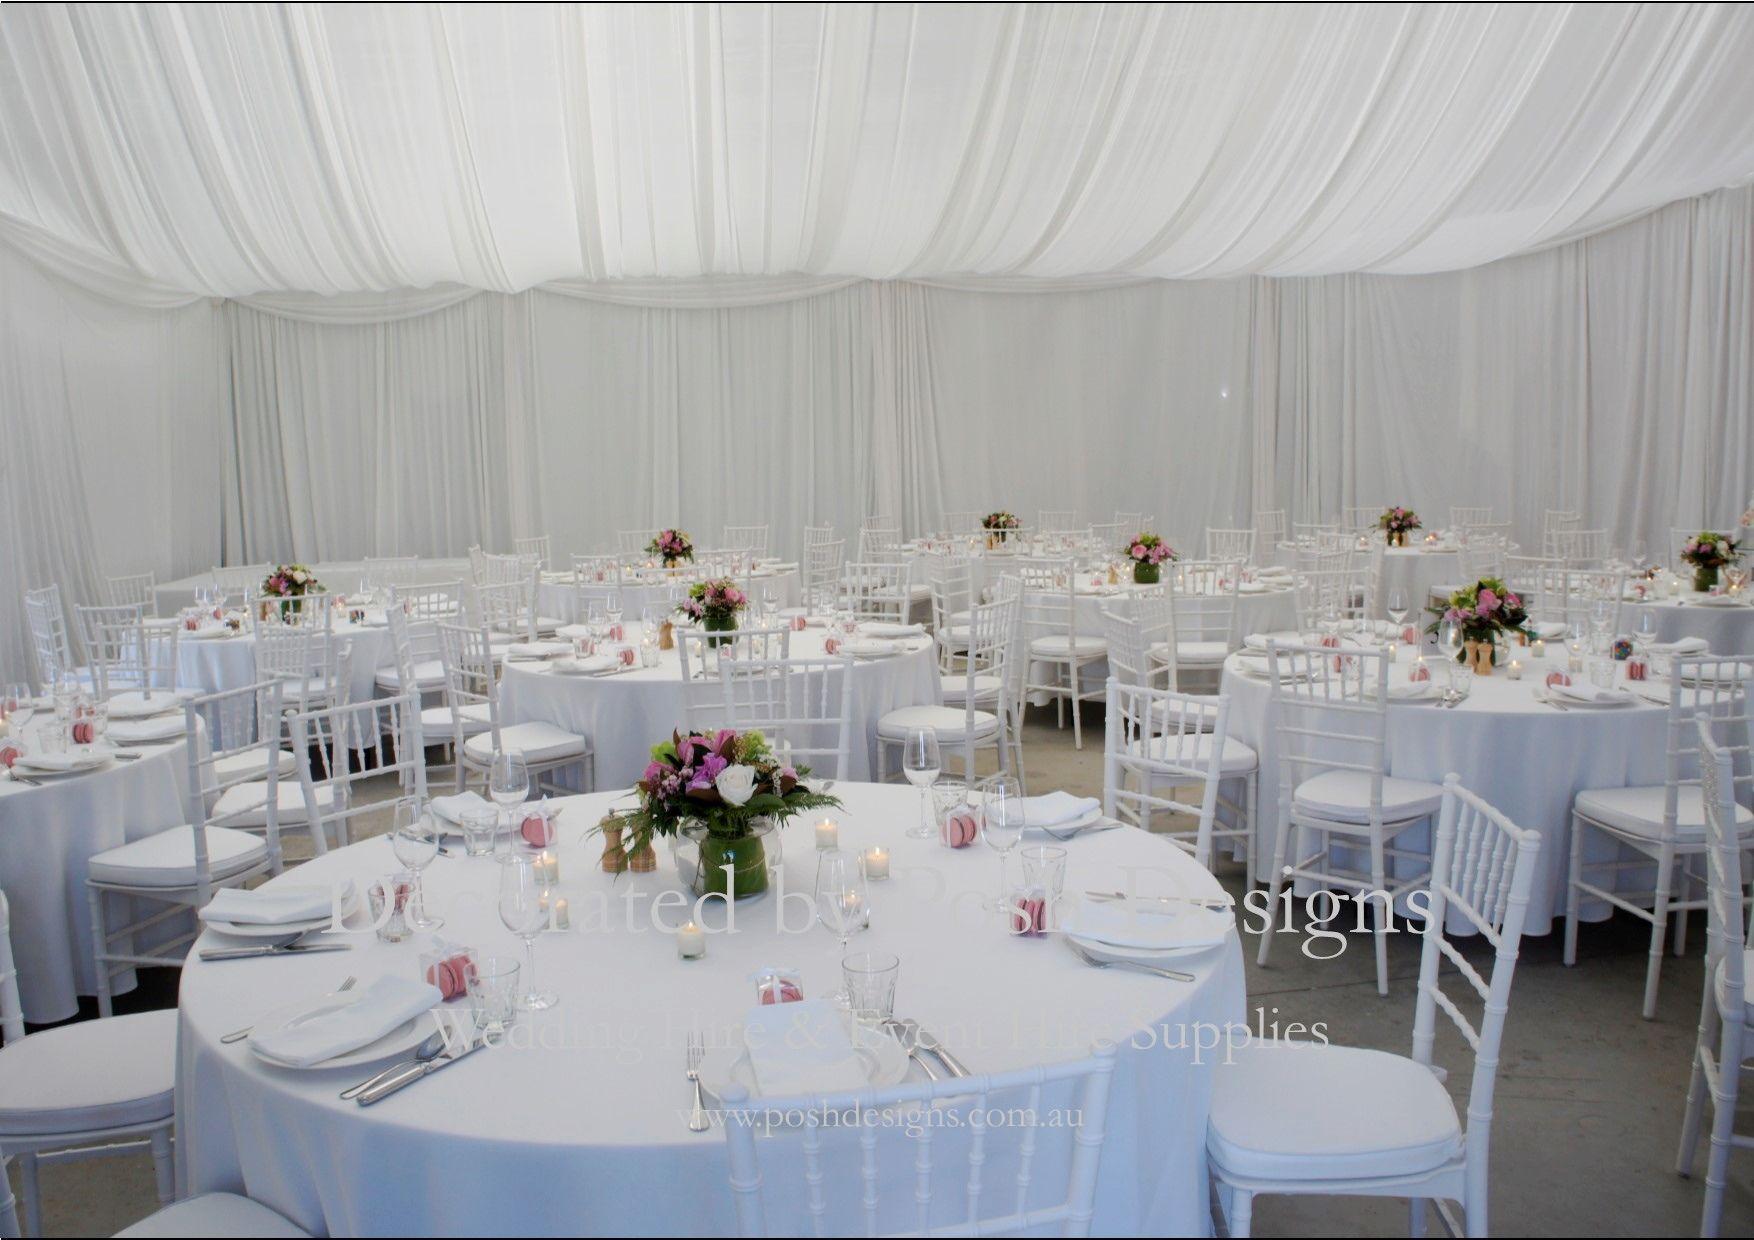 White tiffany chairs, white table cloths, flower white ...